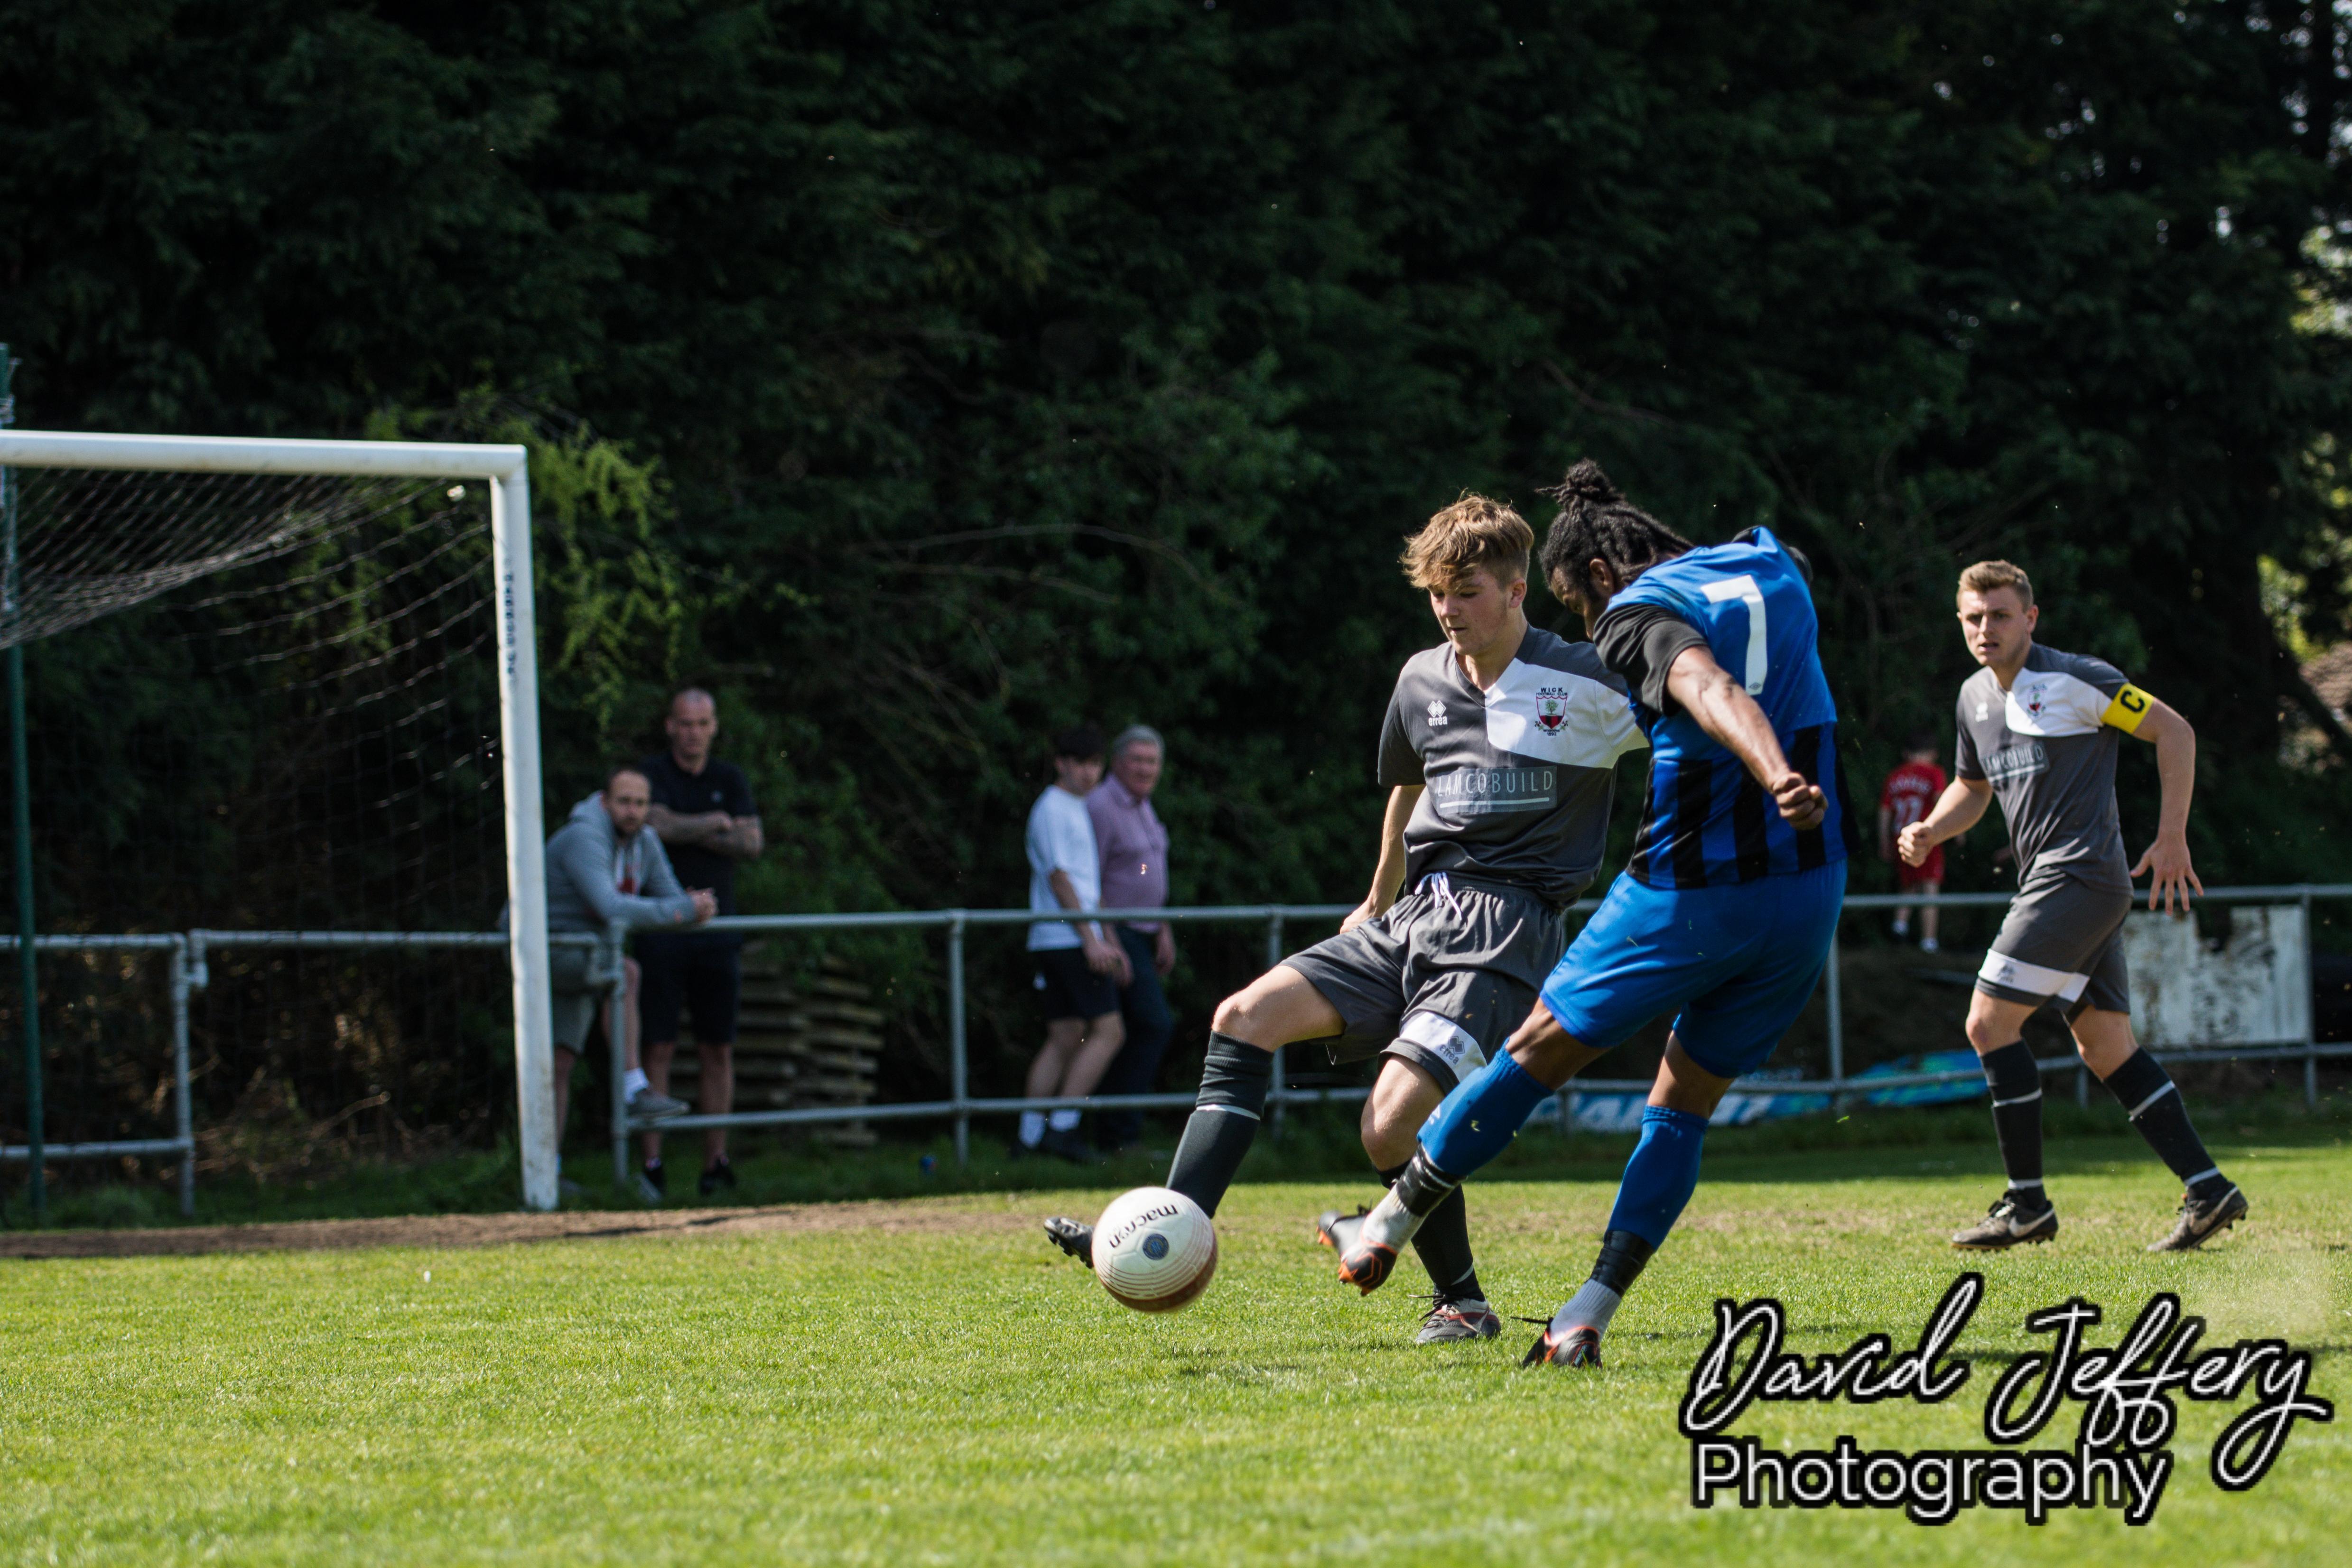 077 Steyn vs Wick, Div1 Cup Final DAVID_